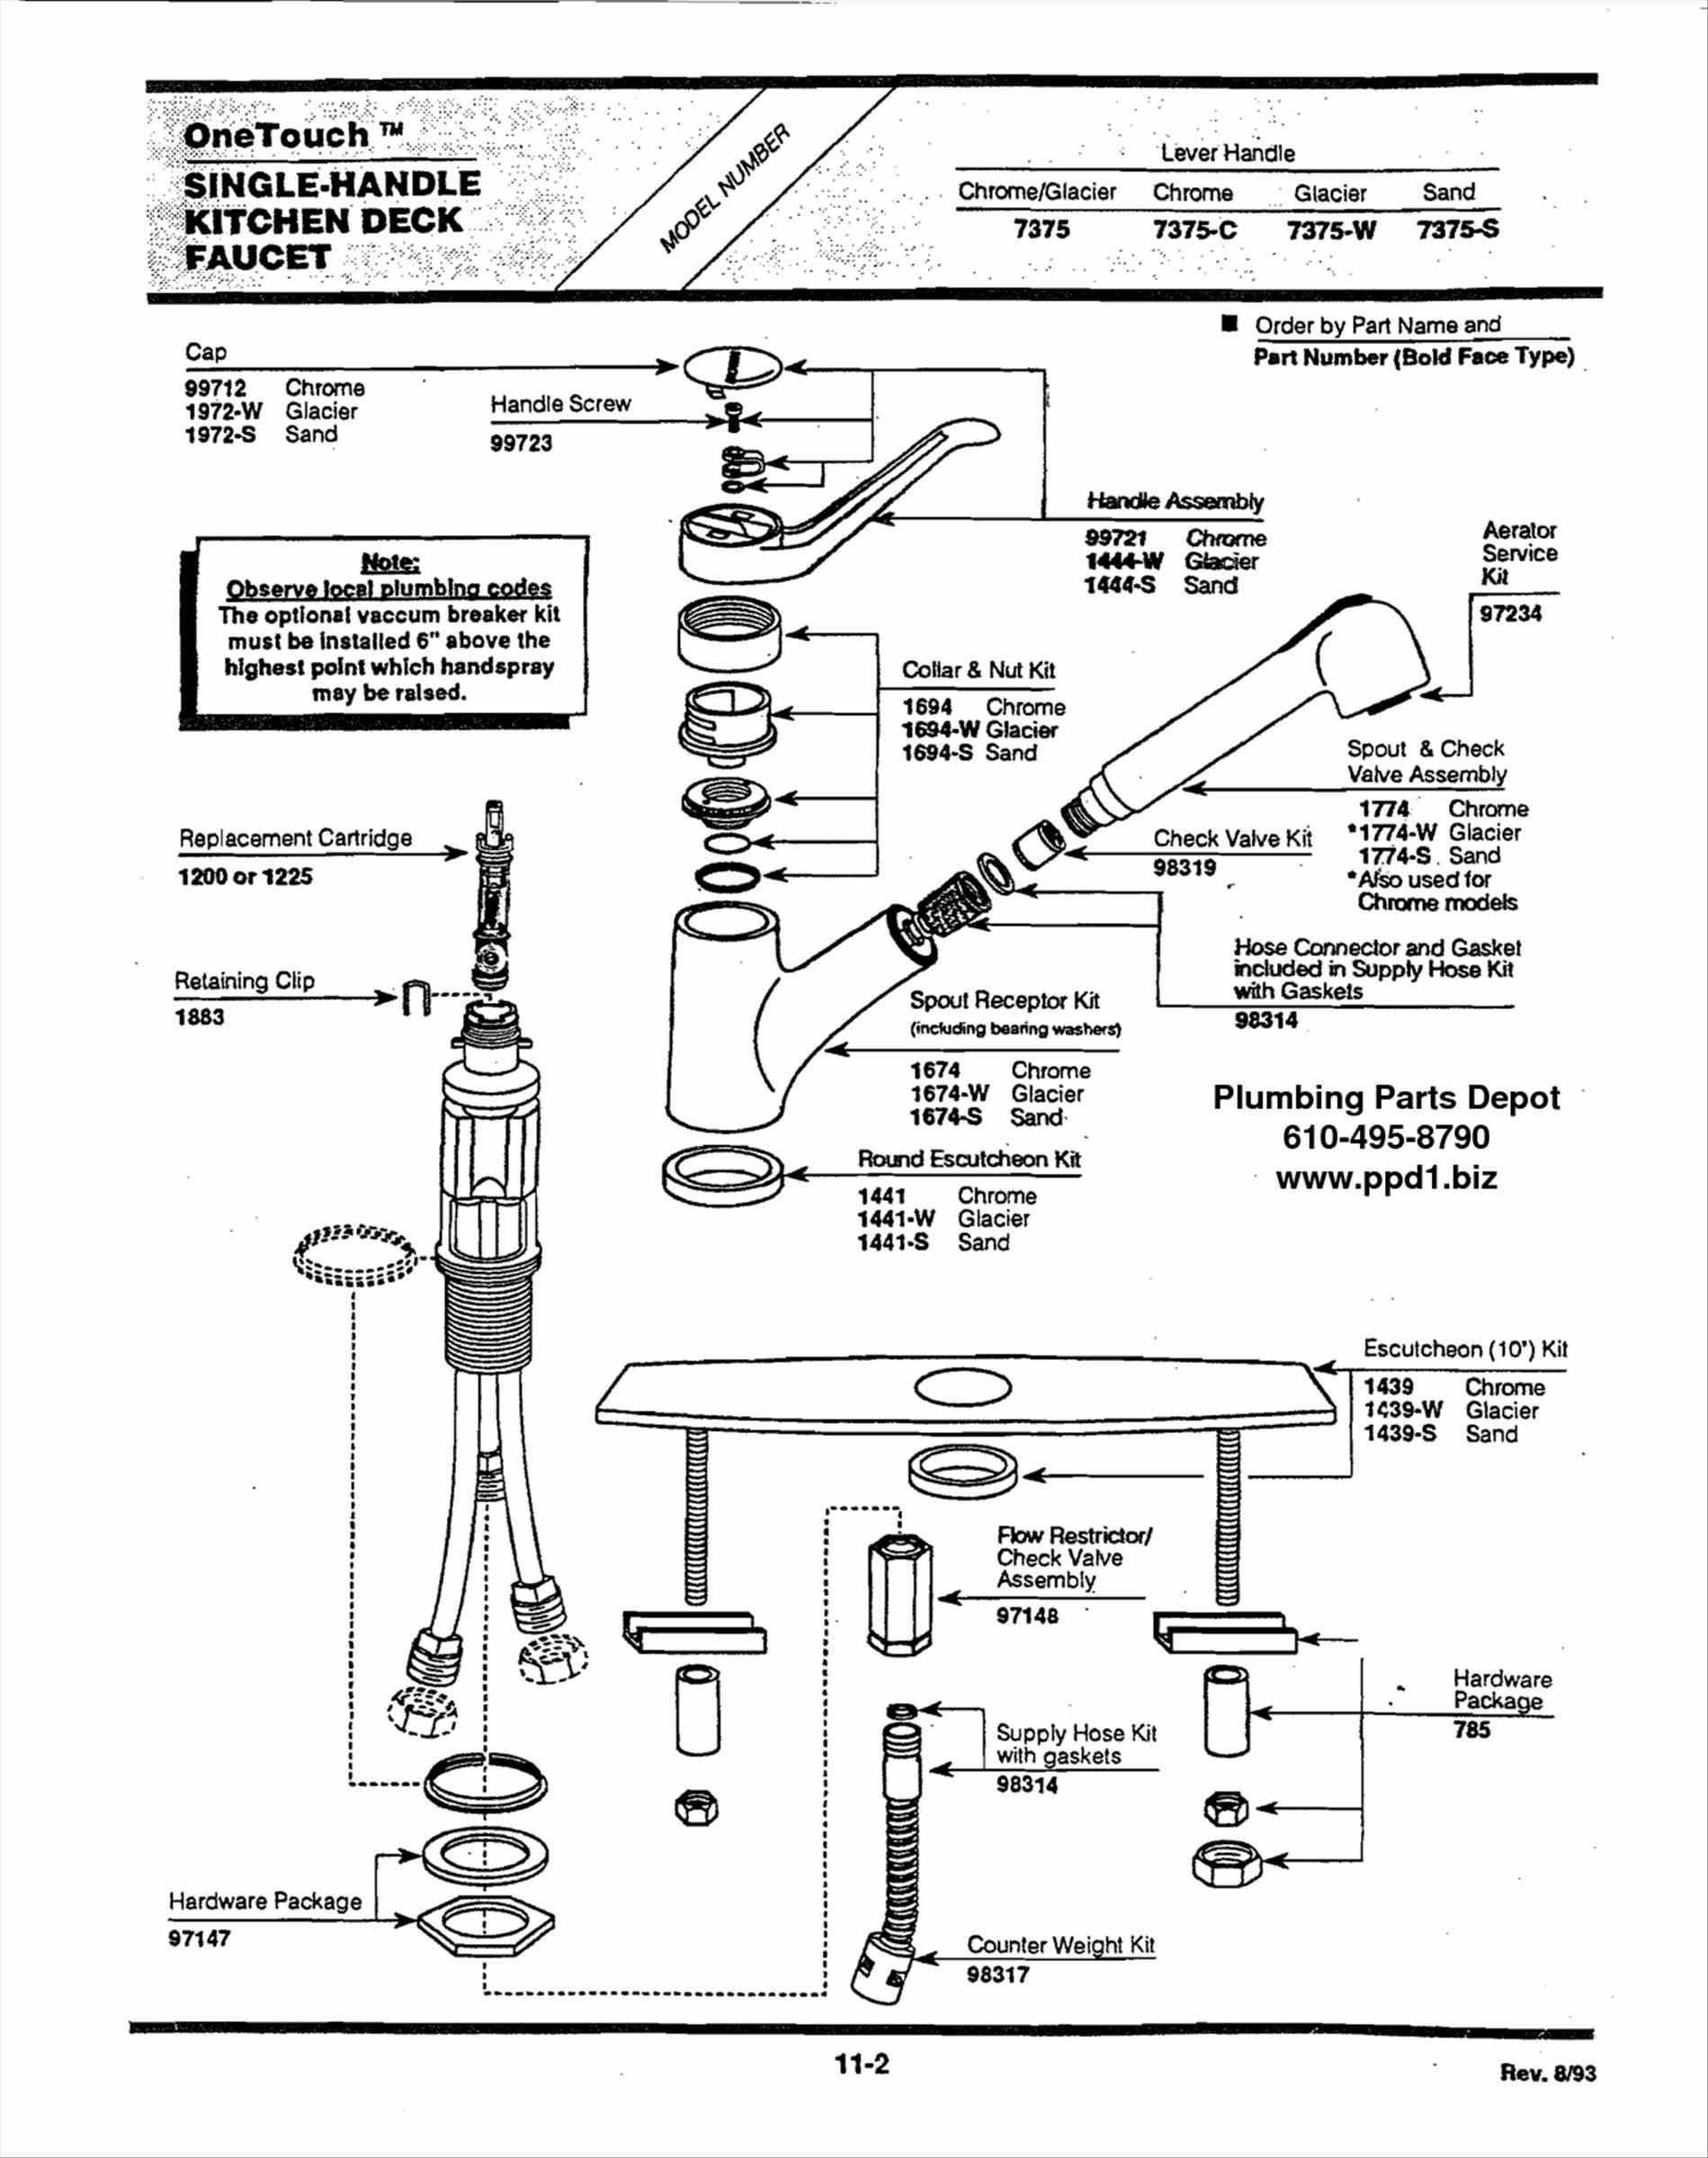 Bathtub Faucet Parts Diagram Beautiful Moen Bathroom Faucets Parts 50 S Of Bathtub Faucet Parts Diagram